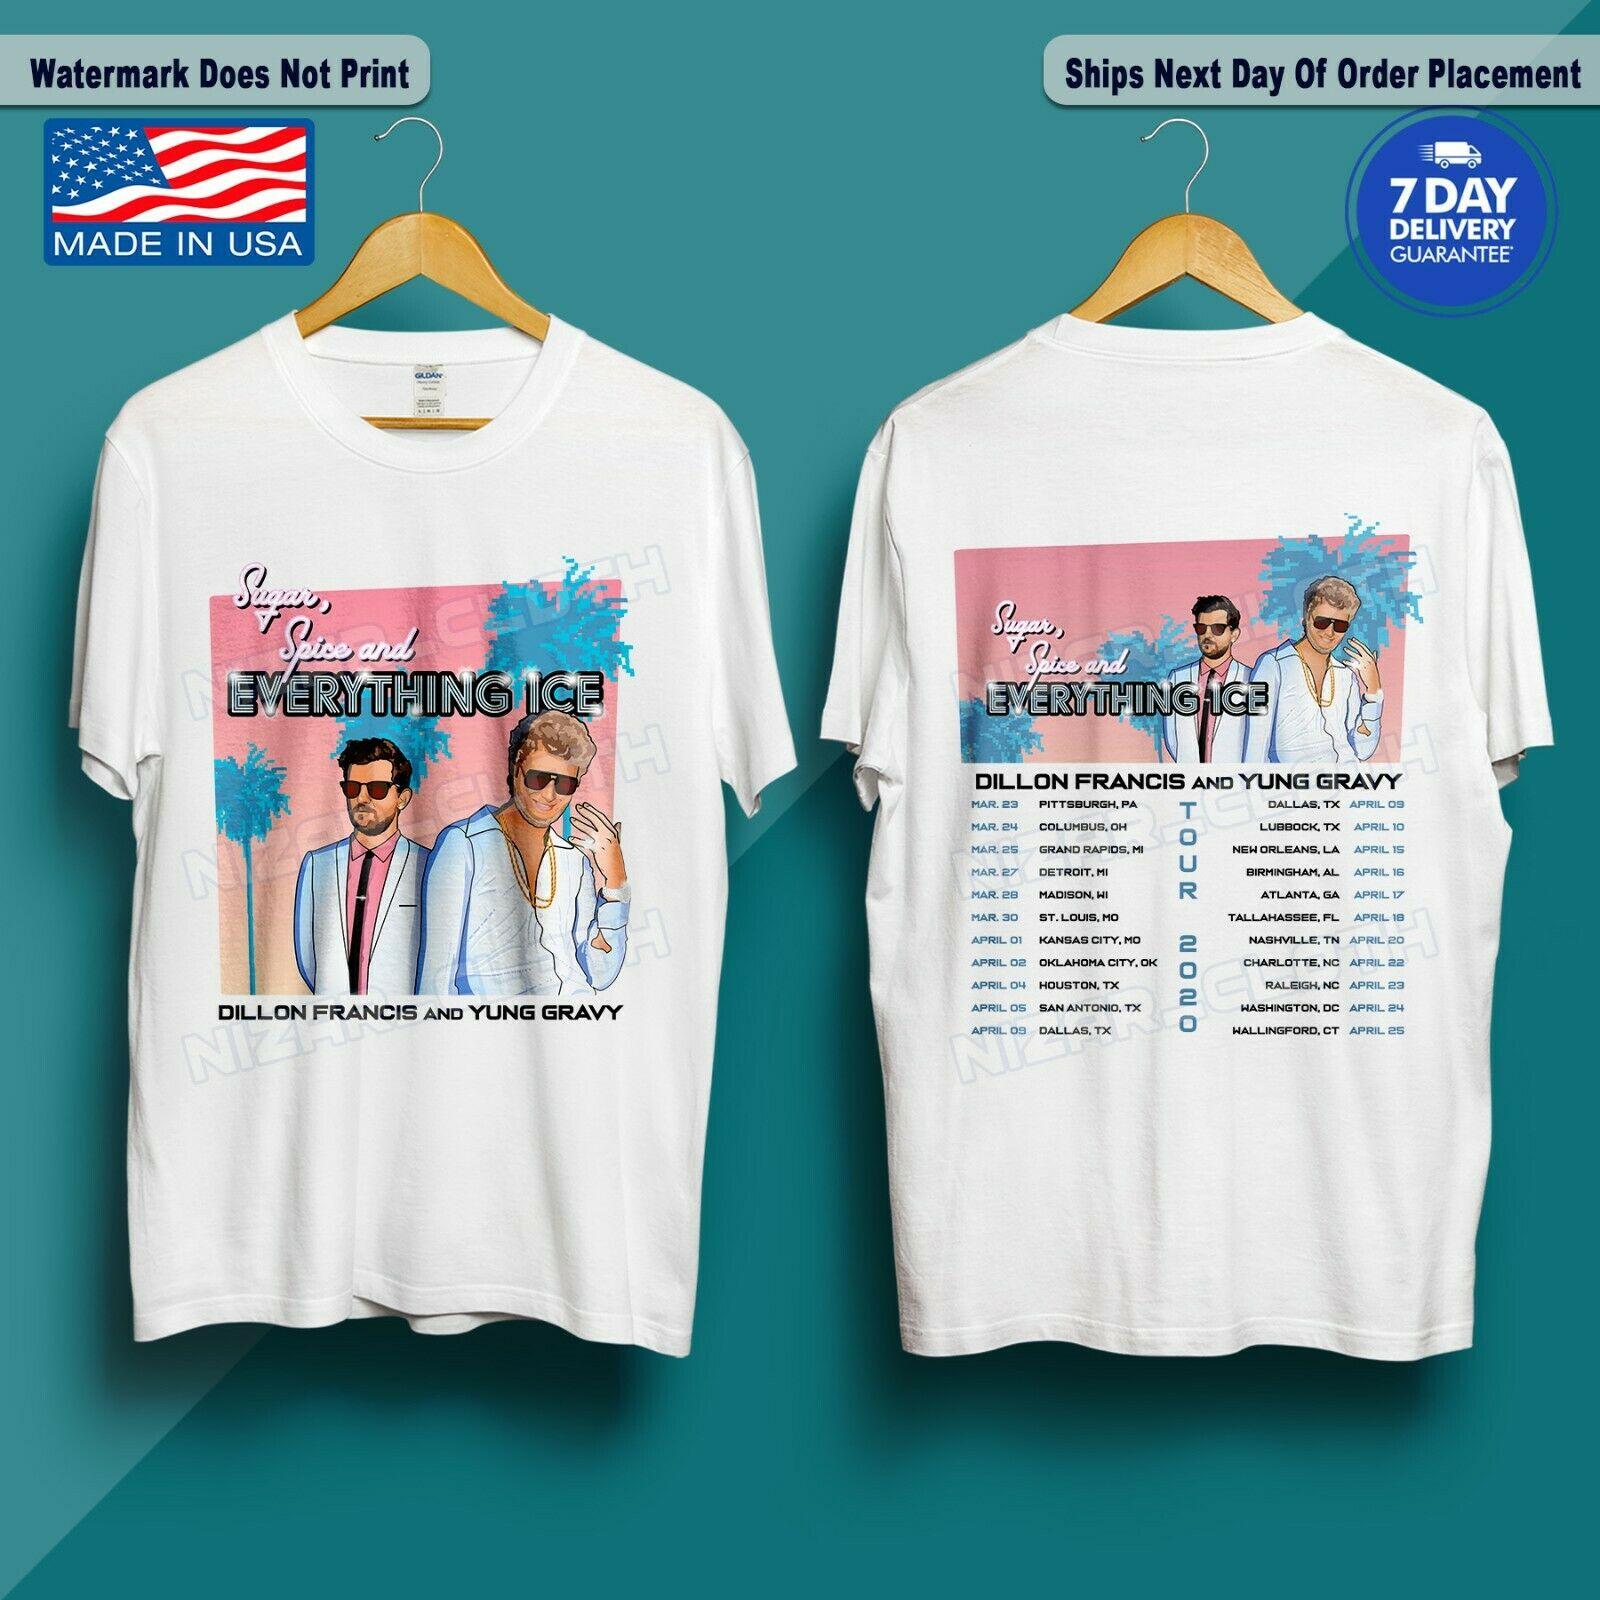 Camiseta de la gira Ice Tour de 2020 azúcar, especias y todo